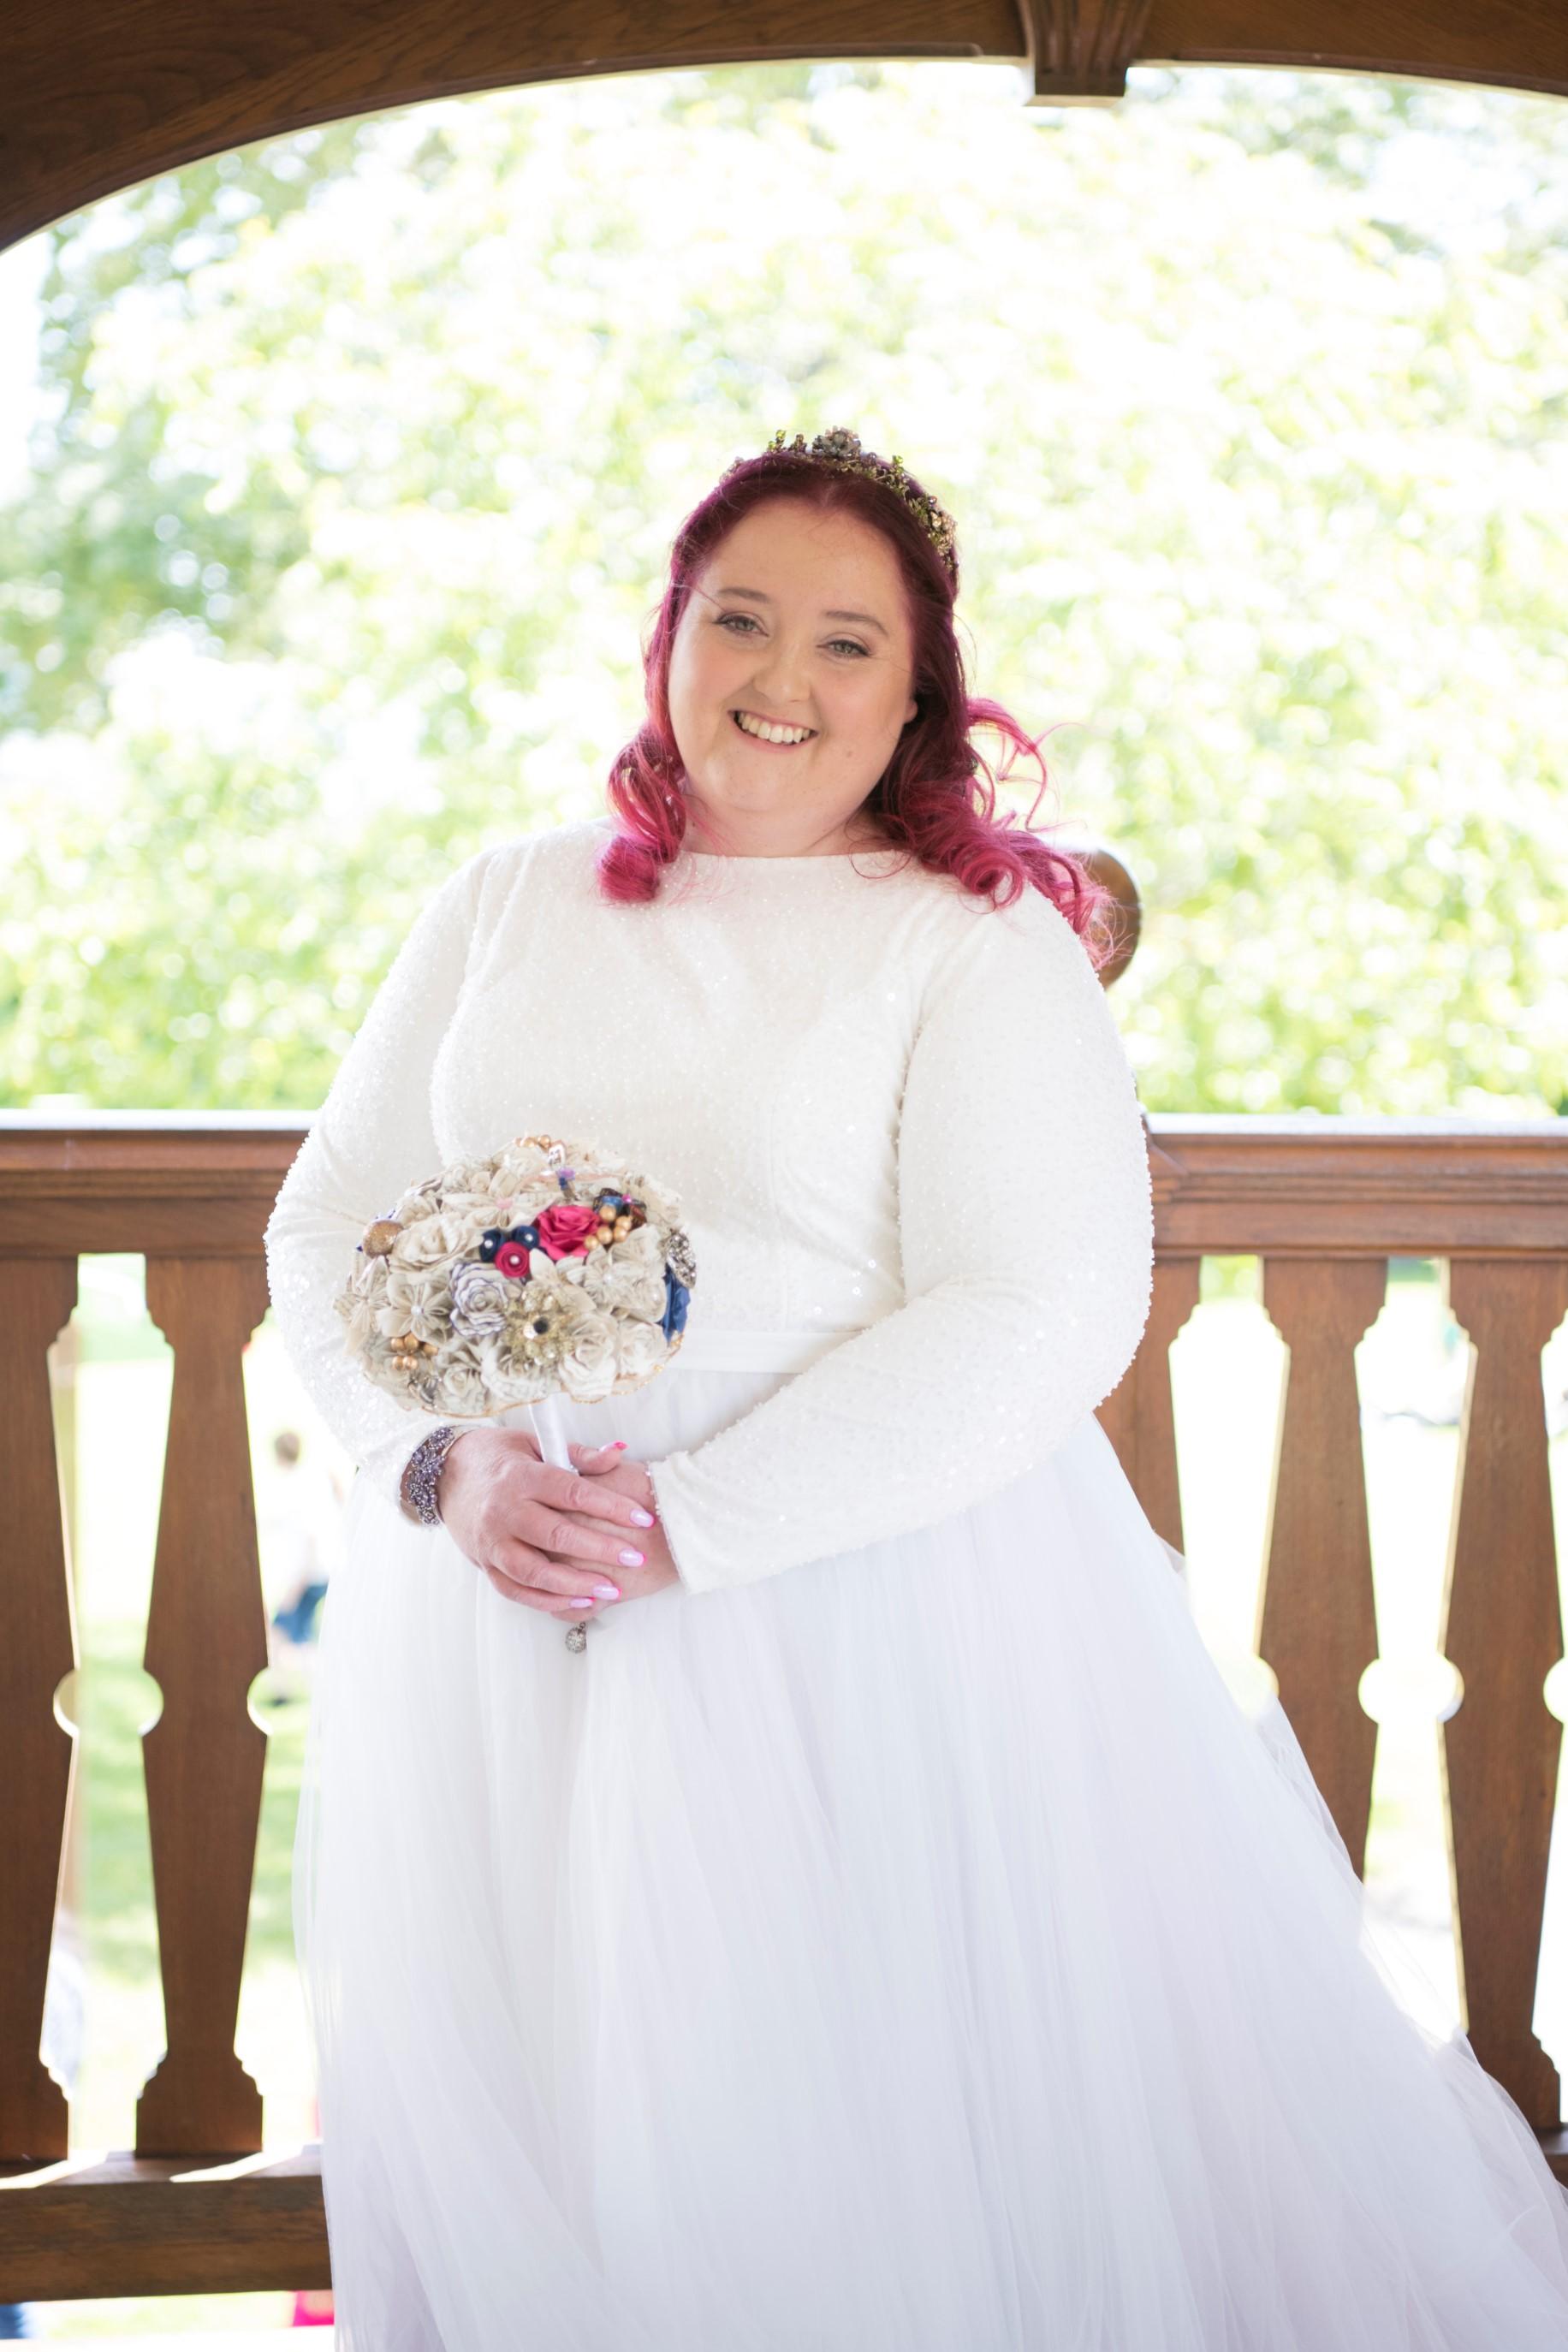 Zoo Wedding- Emma May Photography- Unconventional Wedding- Unique Wedding Inspiration- Pink Haired Bride- Alternative Wedding Bouquet